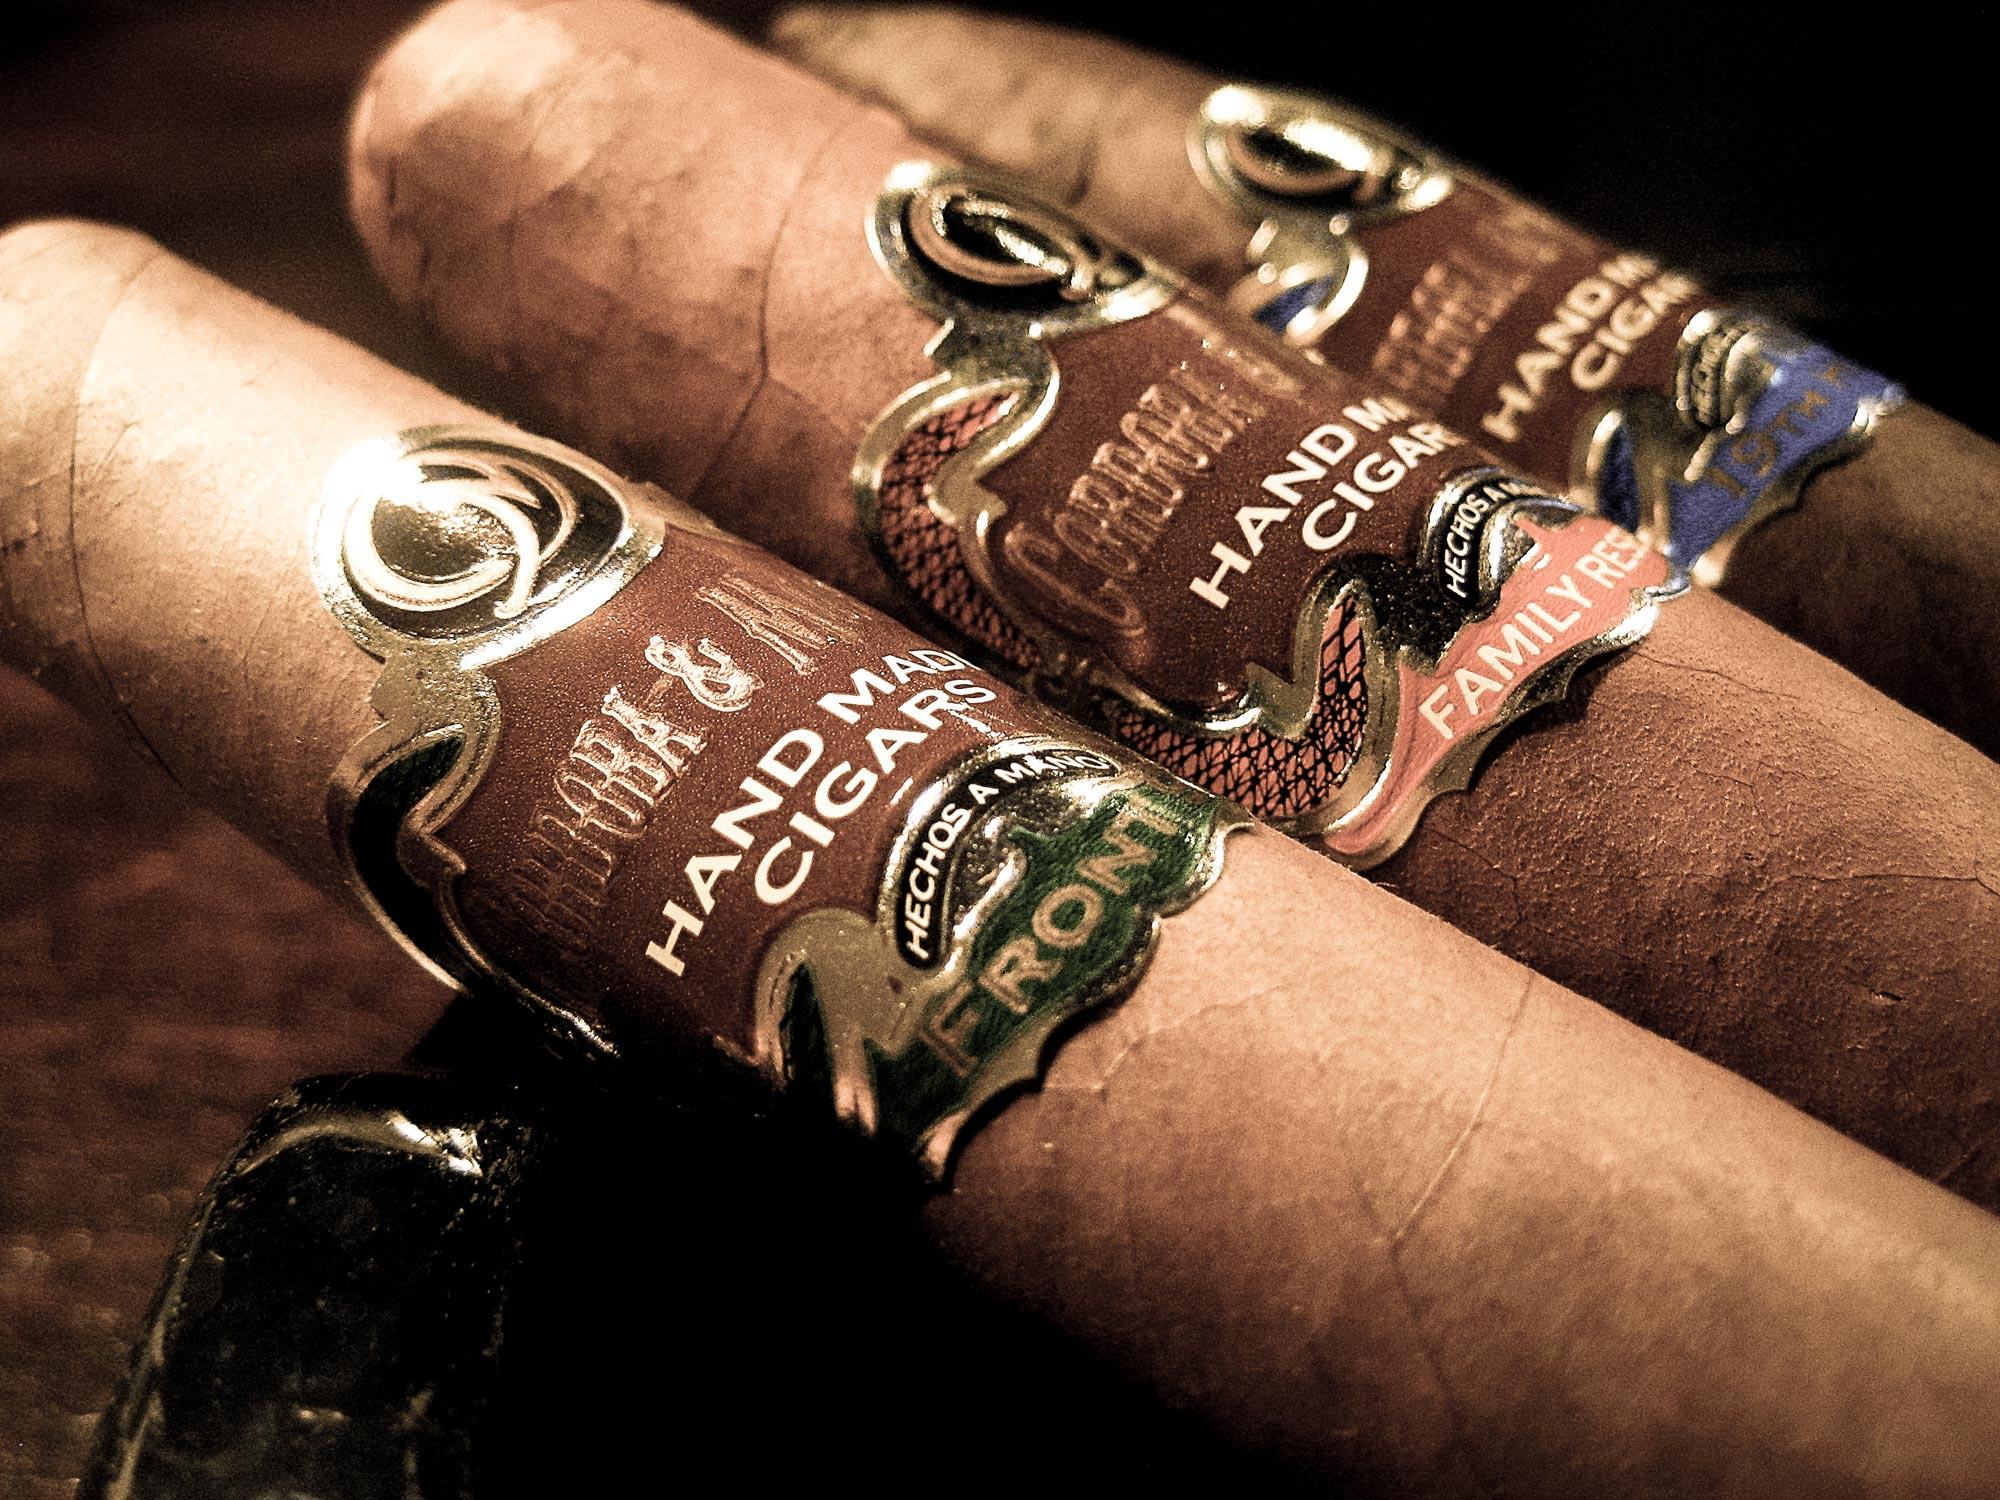 Cordoba & Morales handmade boutique cigars